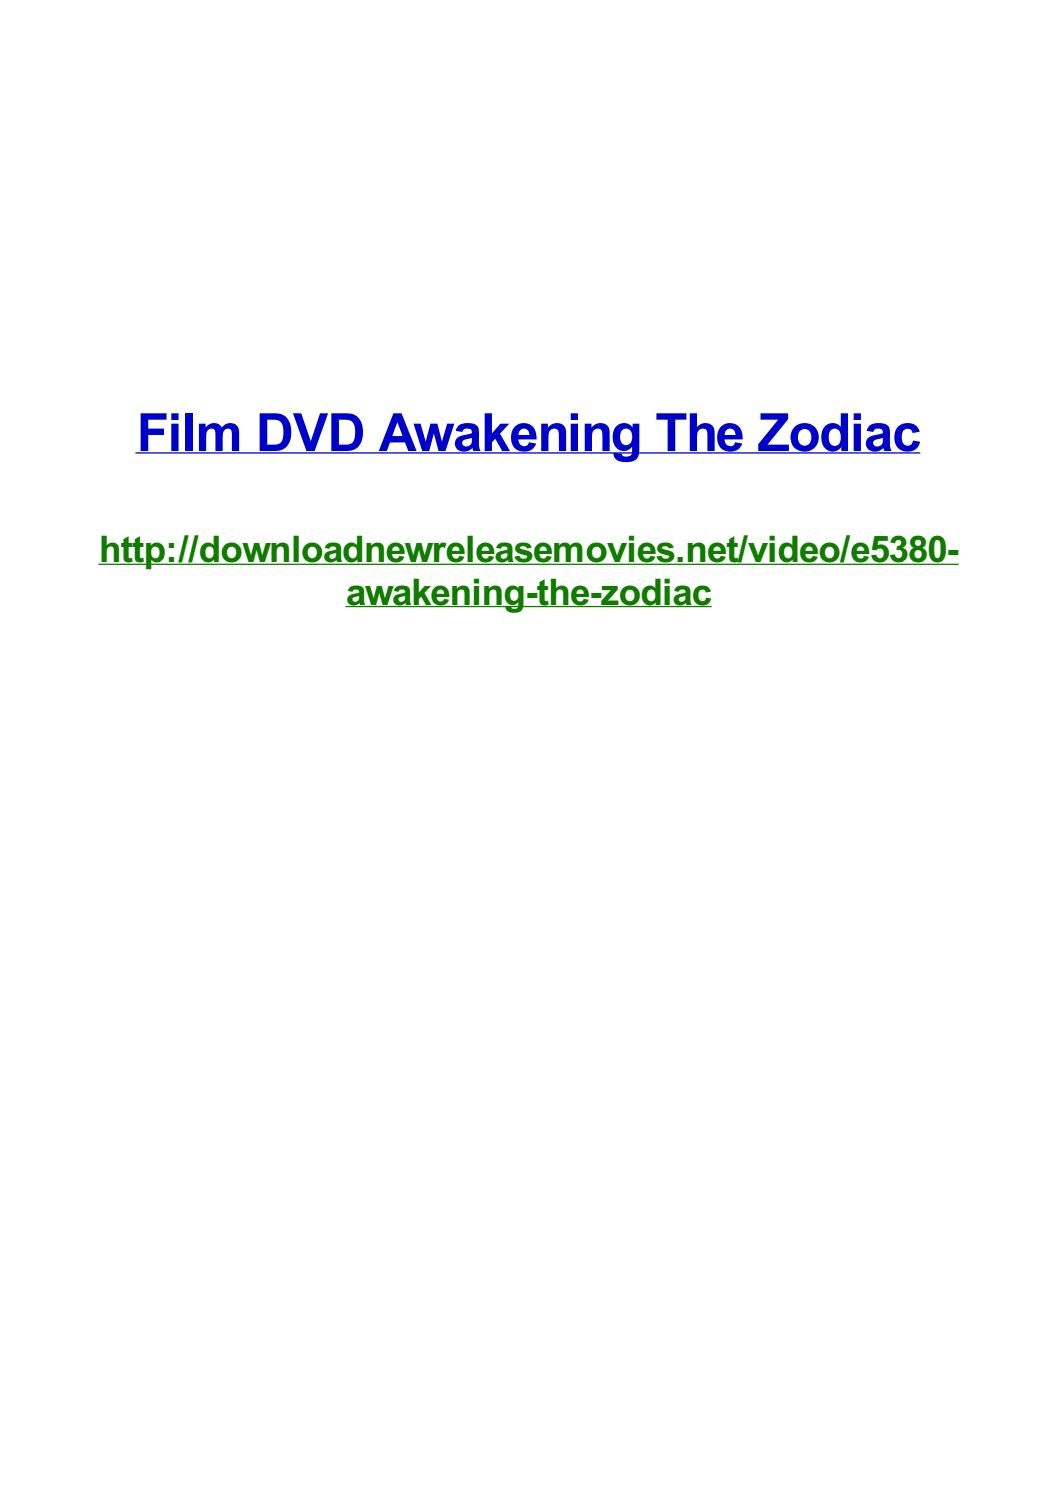 Film Dvd Awakening The Zodiac By Frank Seamons Issuu